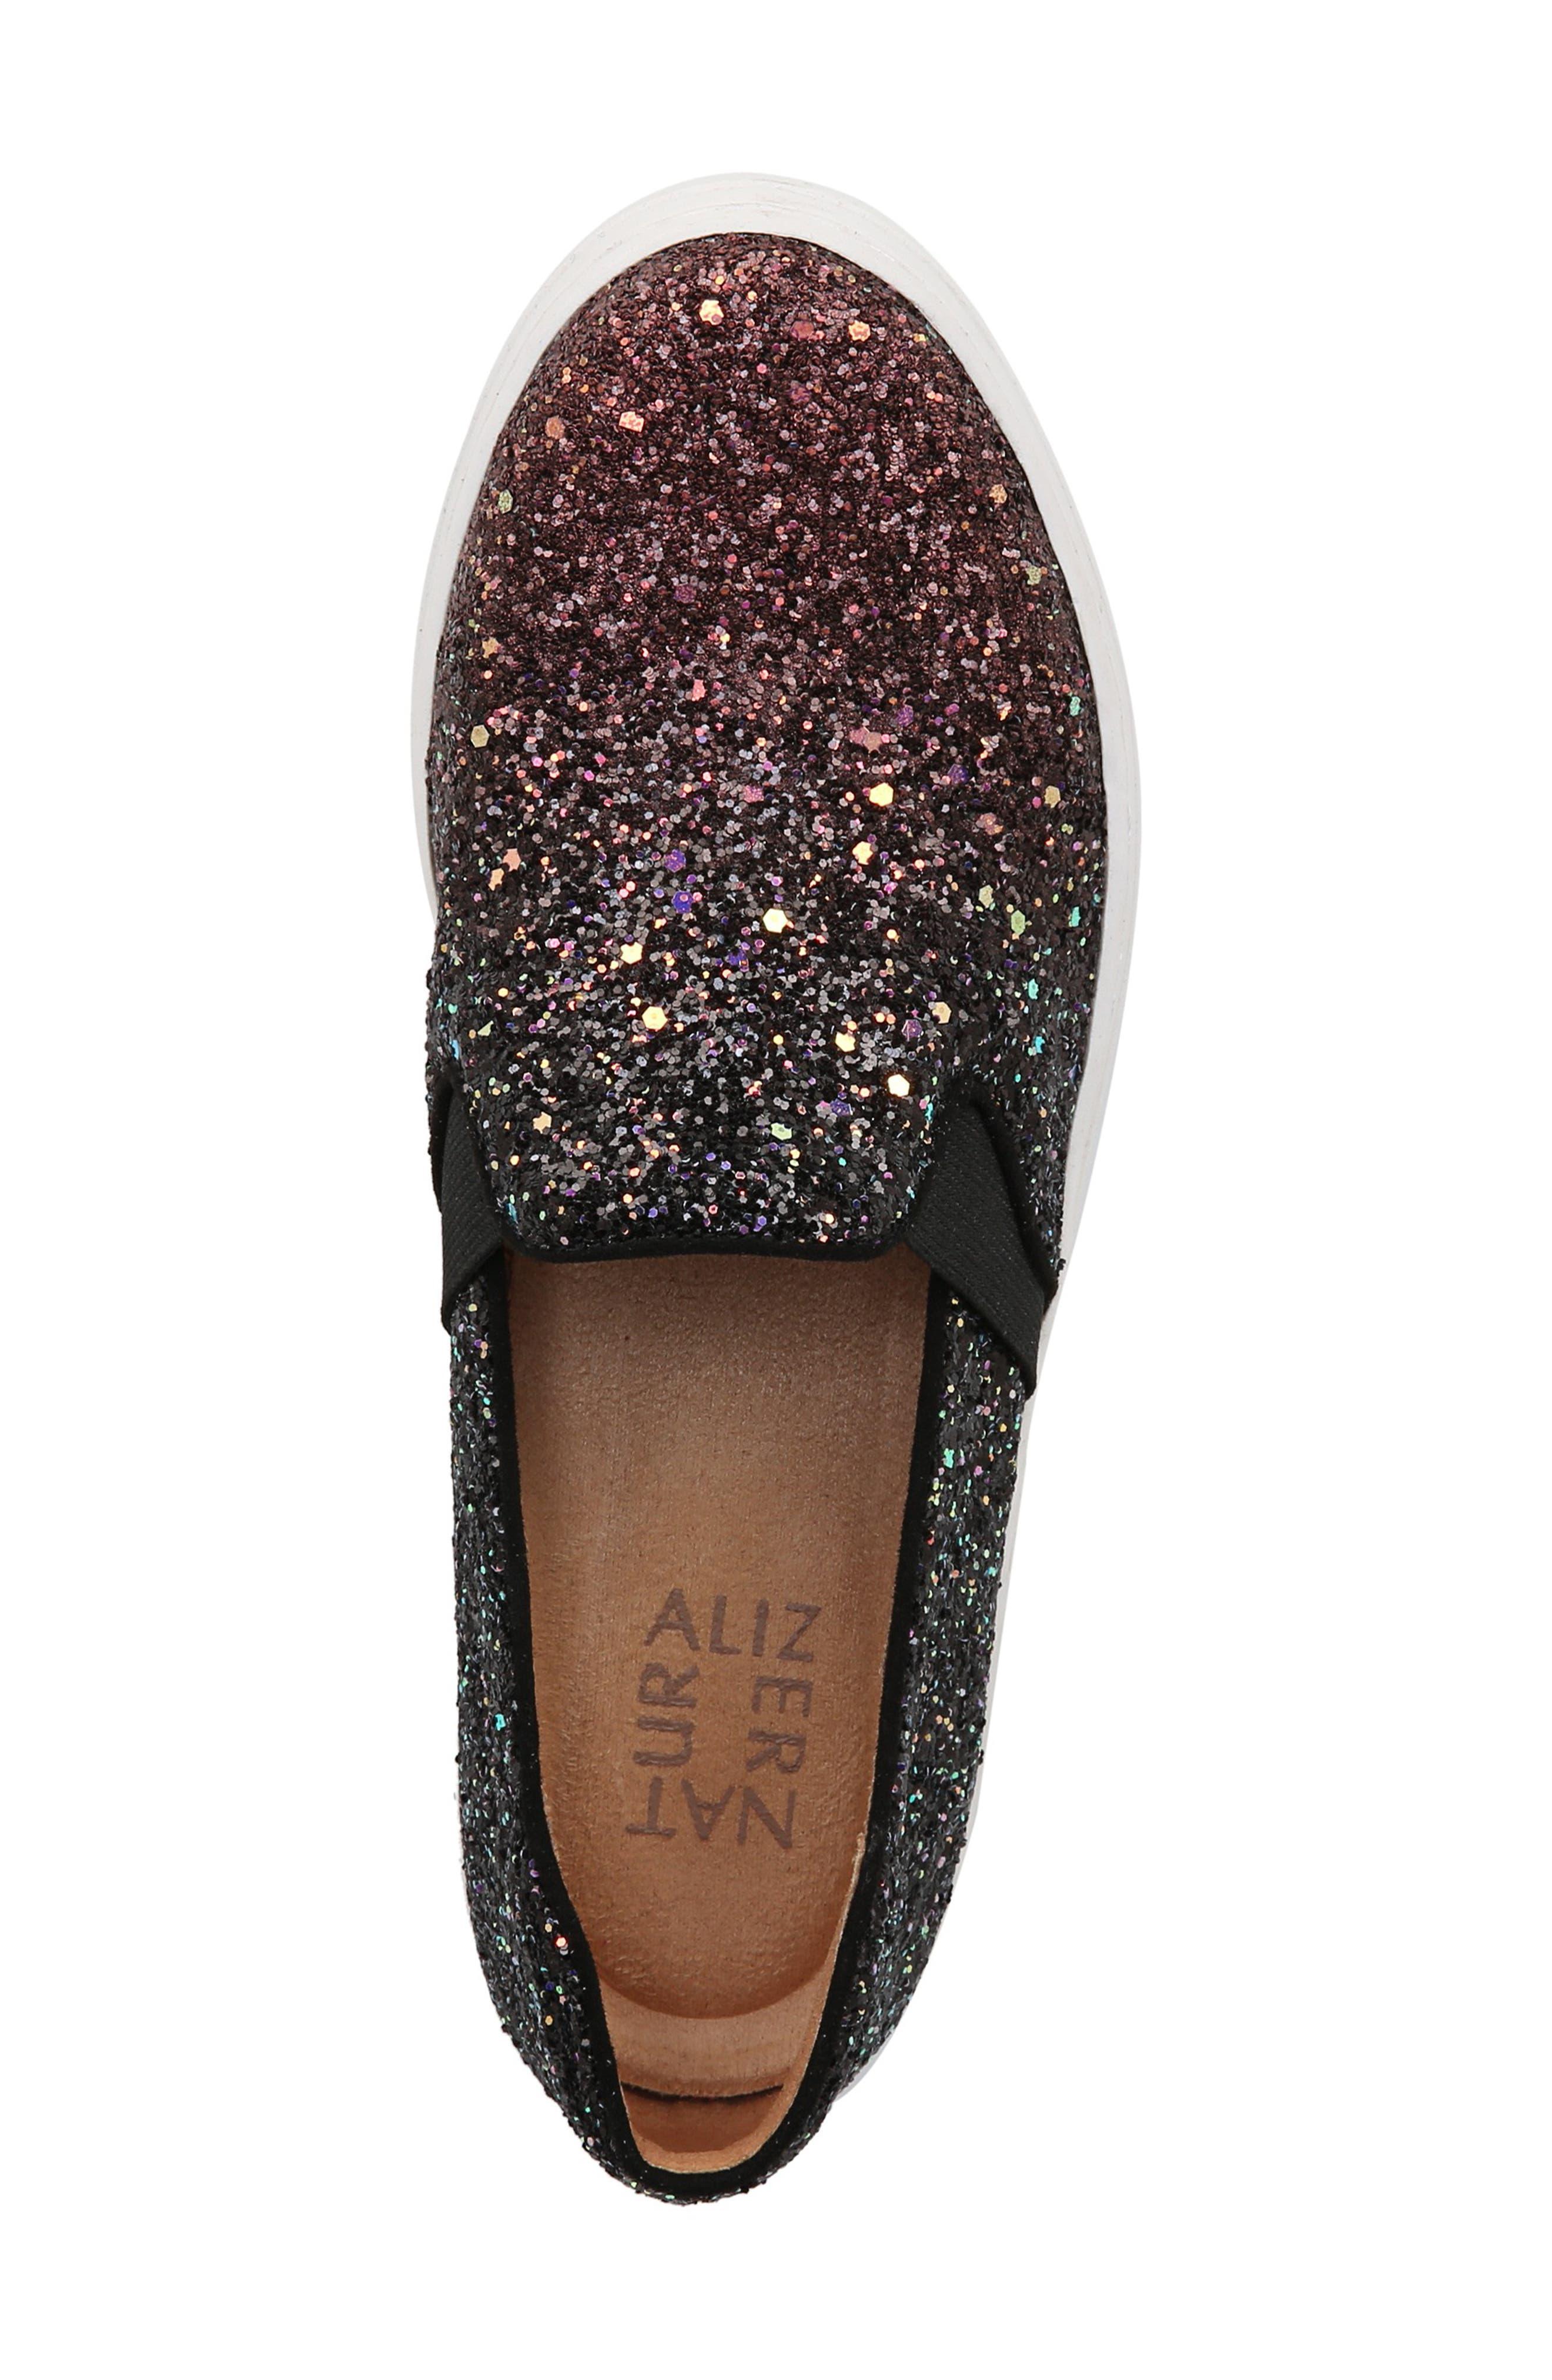 NATURALIZER, Carly Slip-On Sneaker, Alternate thumbnail 4, color, MULTI GLITTER FABRIC